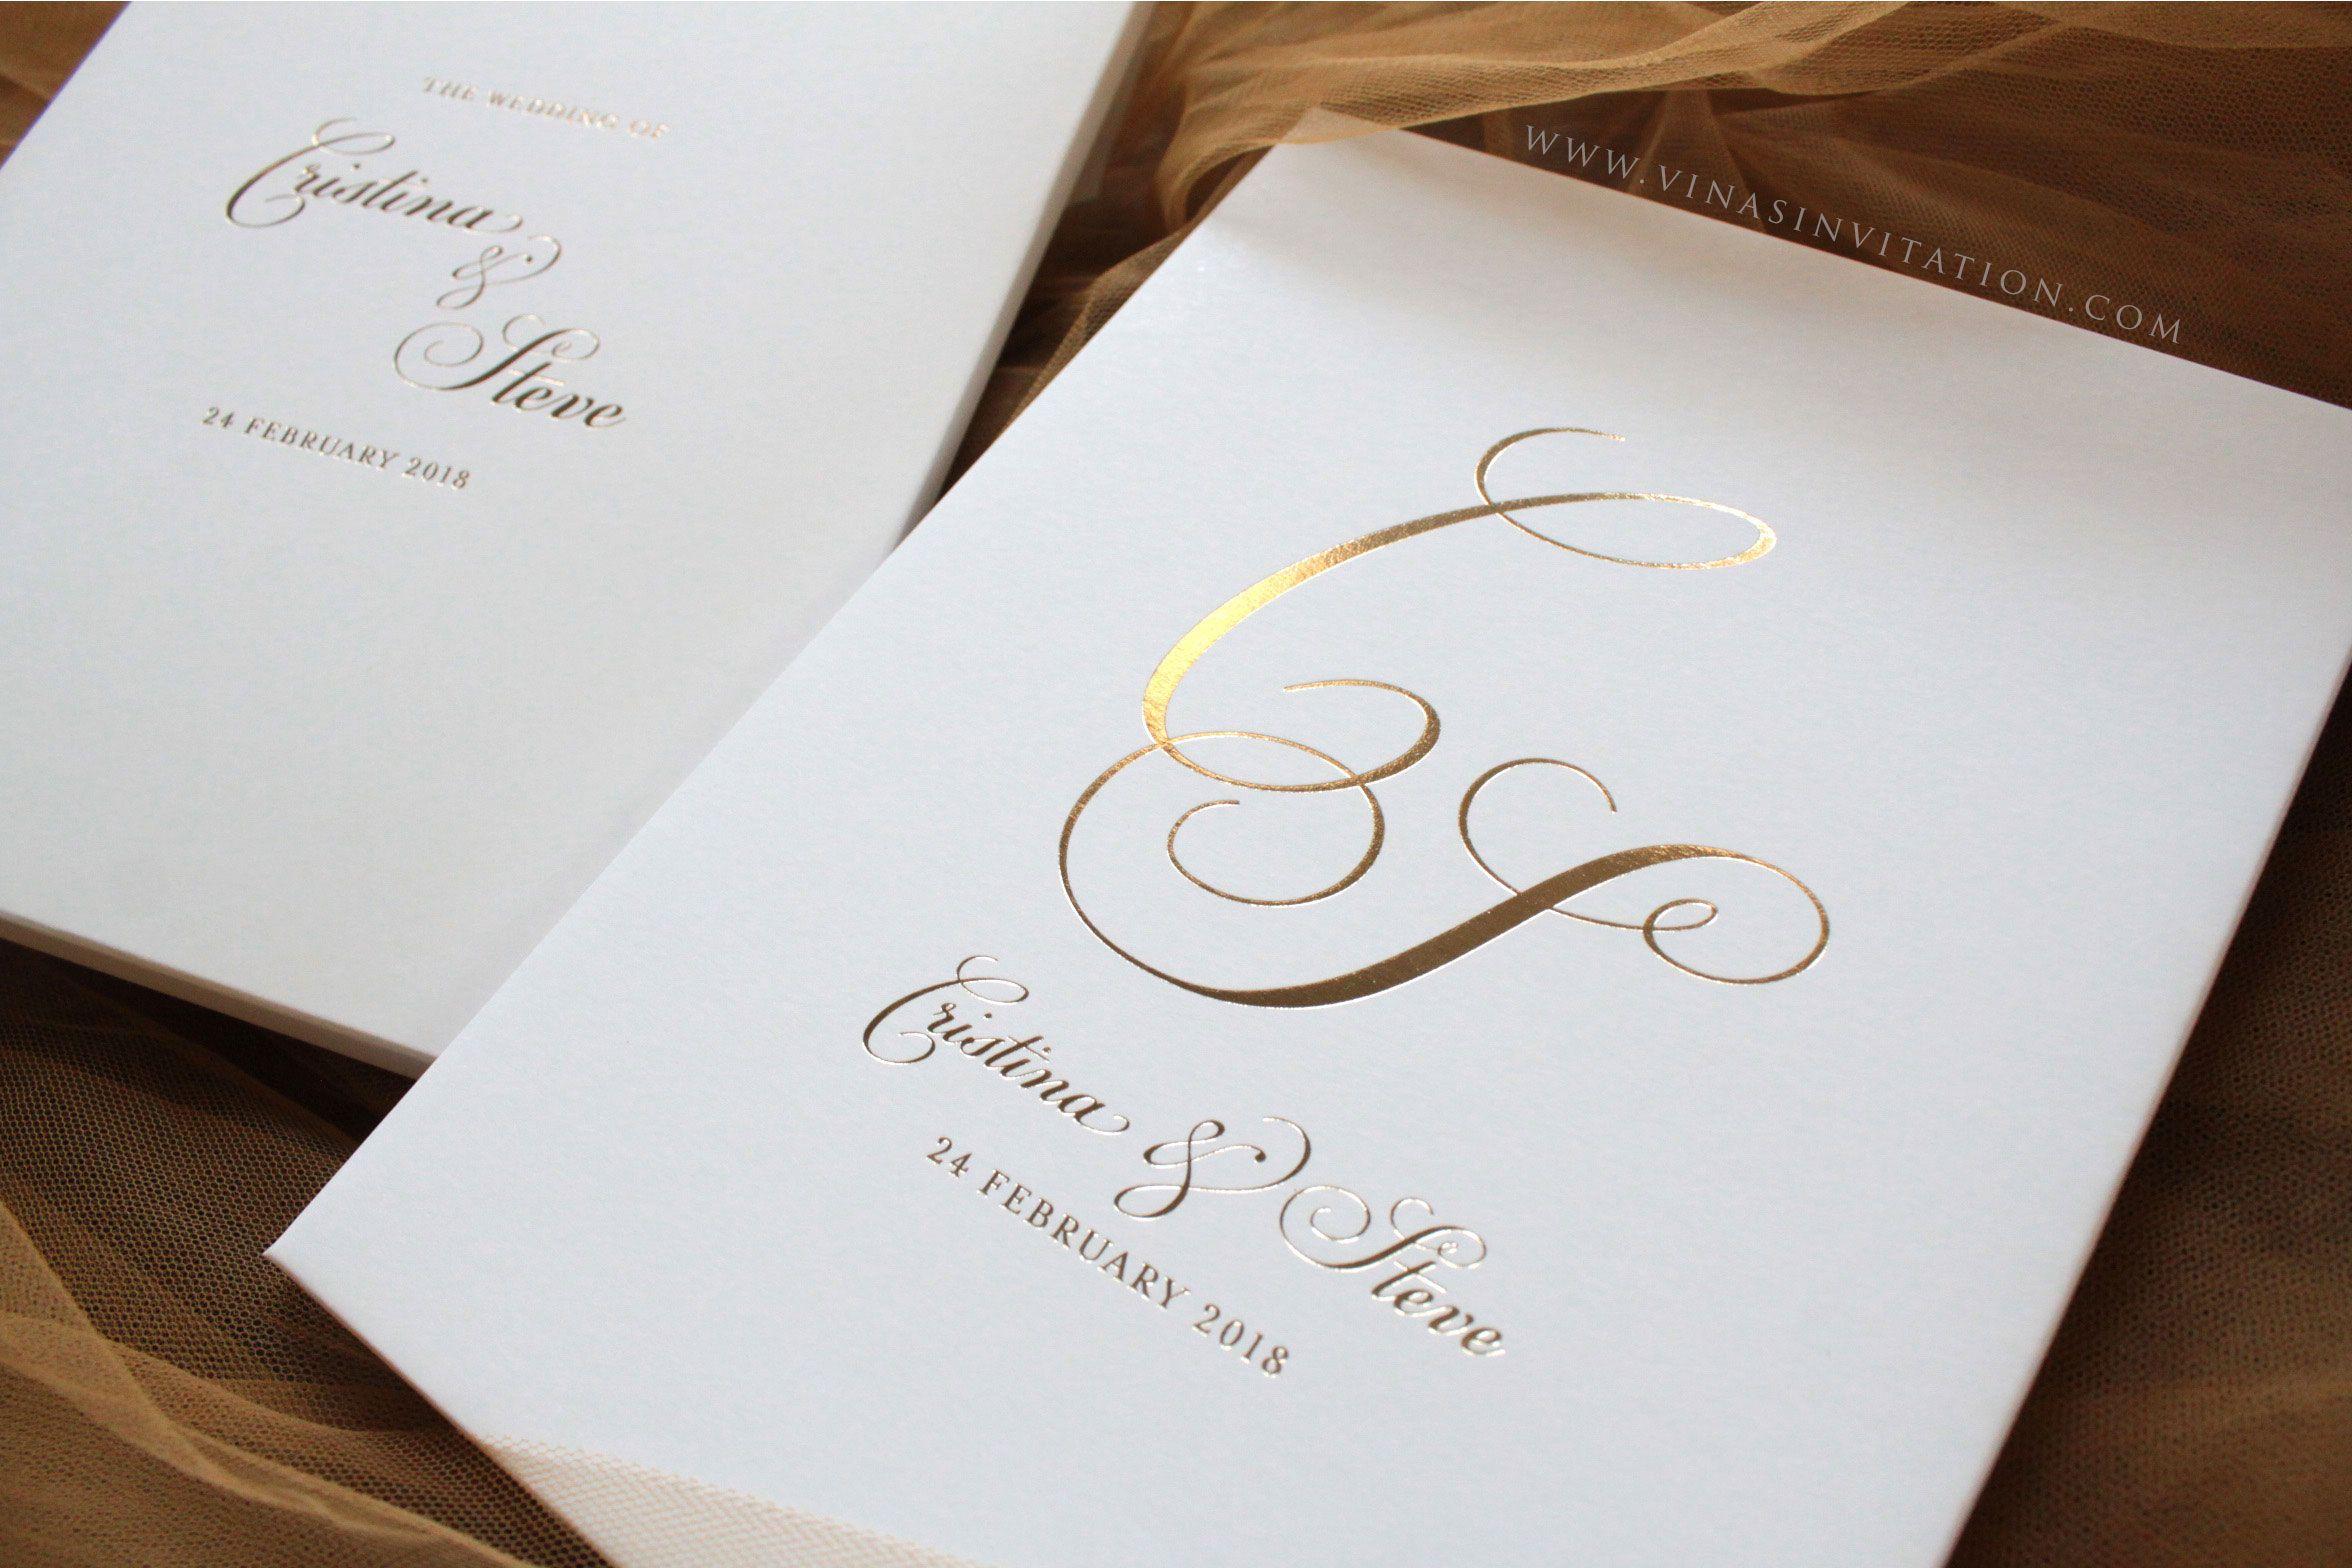 vinas invitation. sydney wedding invitation. indonesia wedding ...